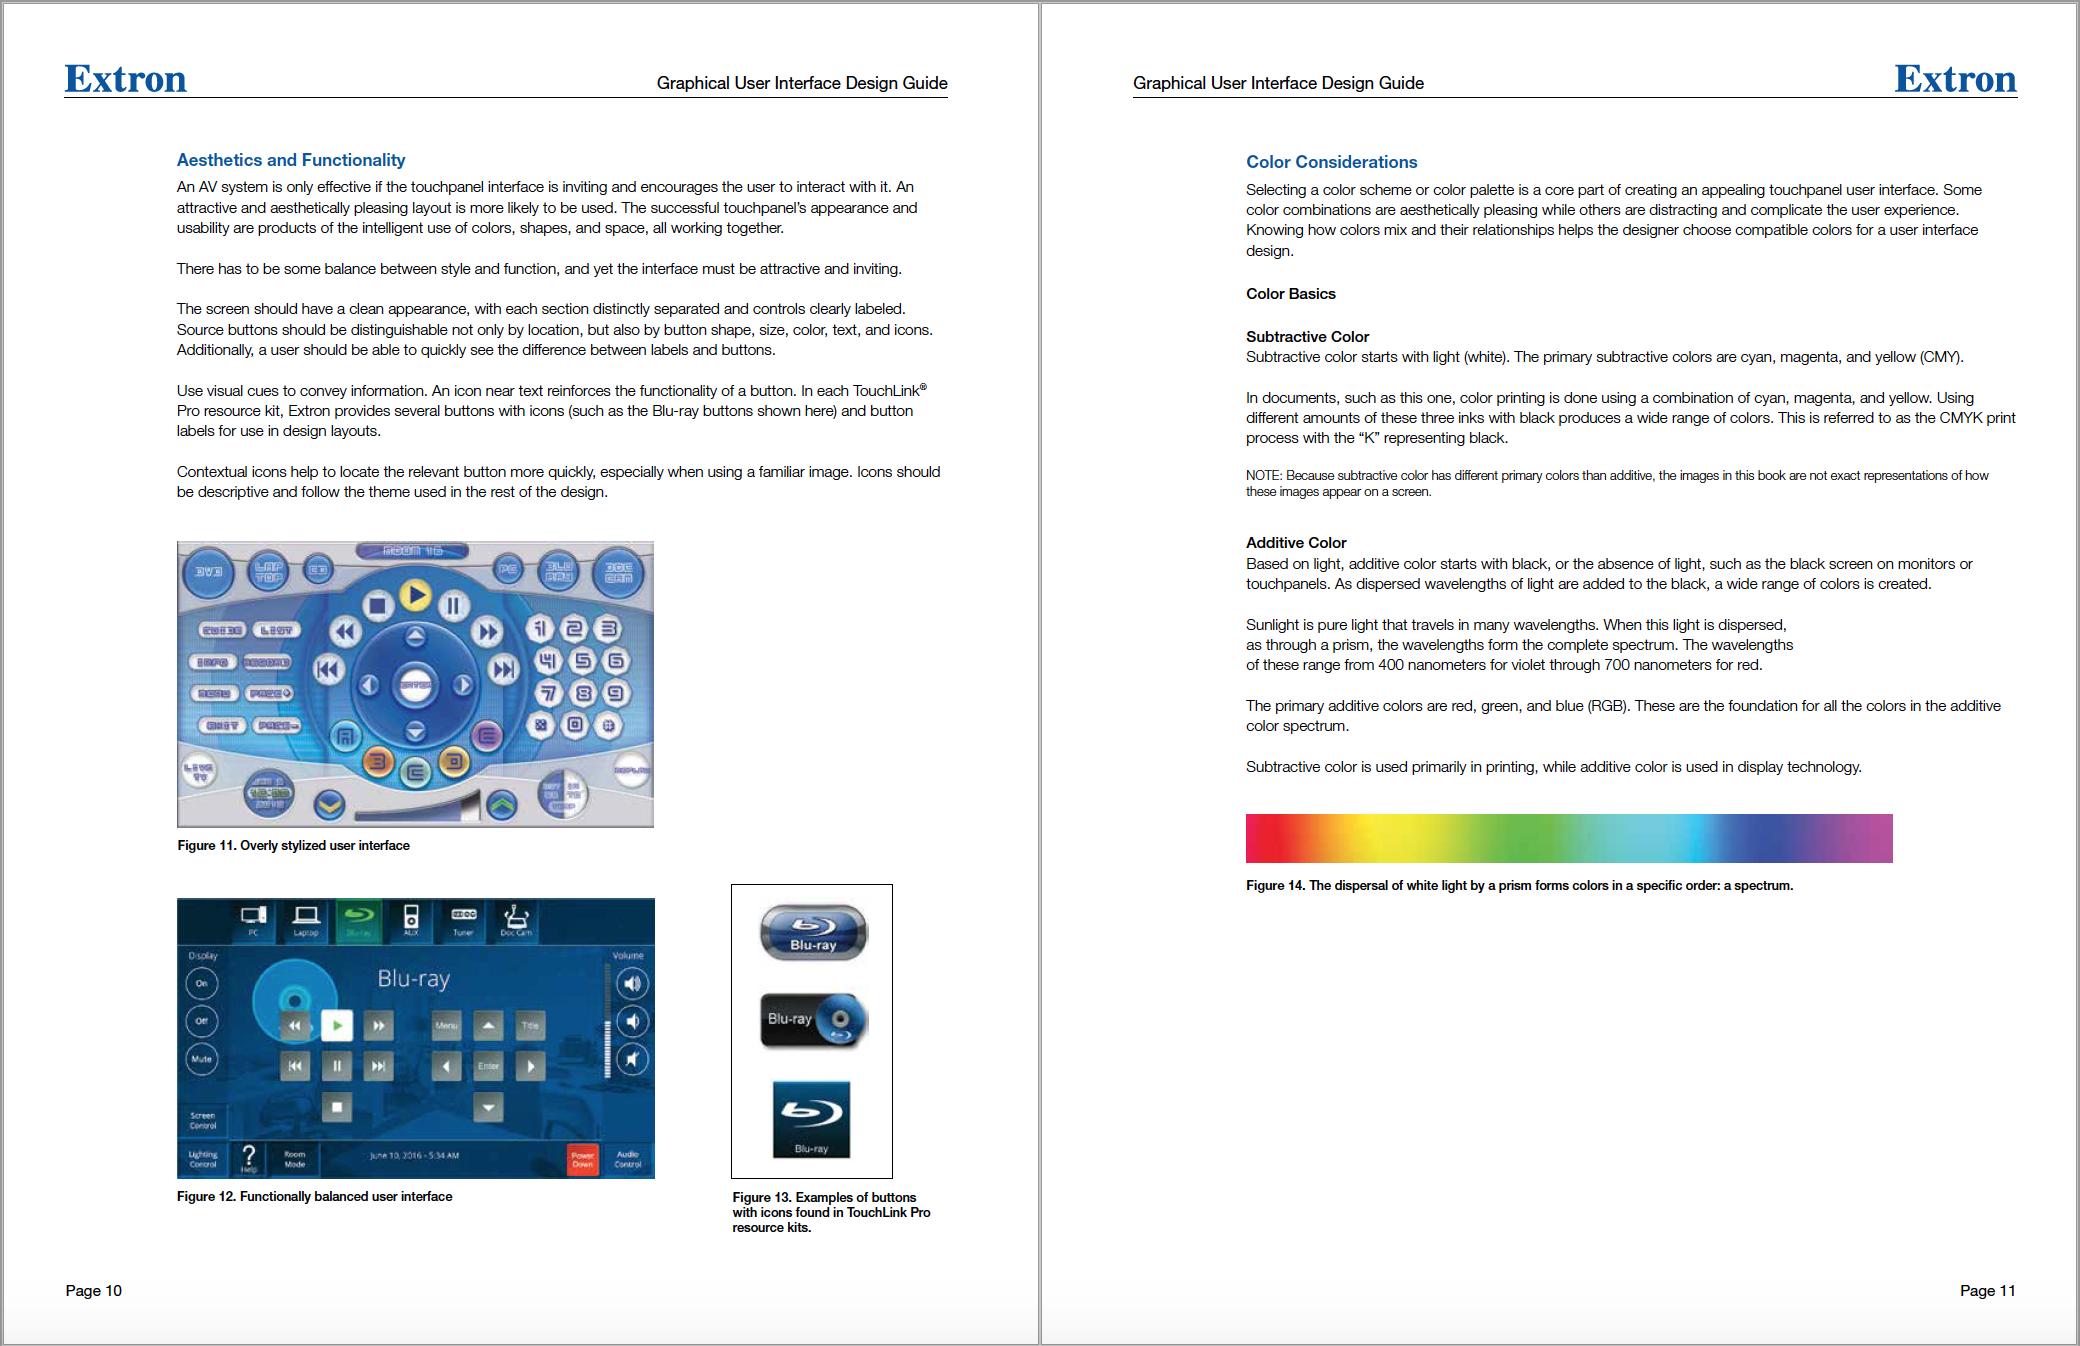 Previous version of the GUI Design Guide.